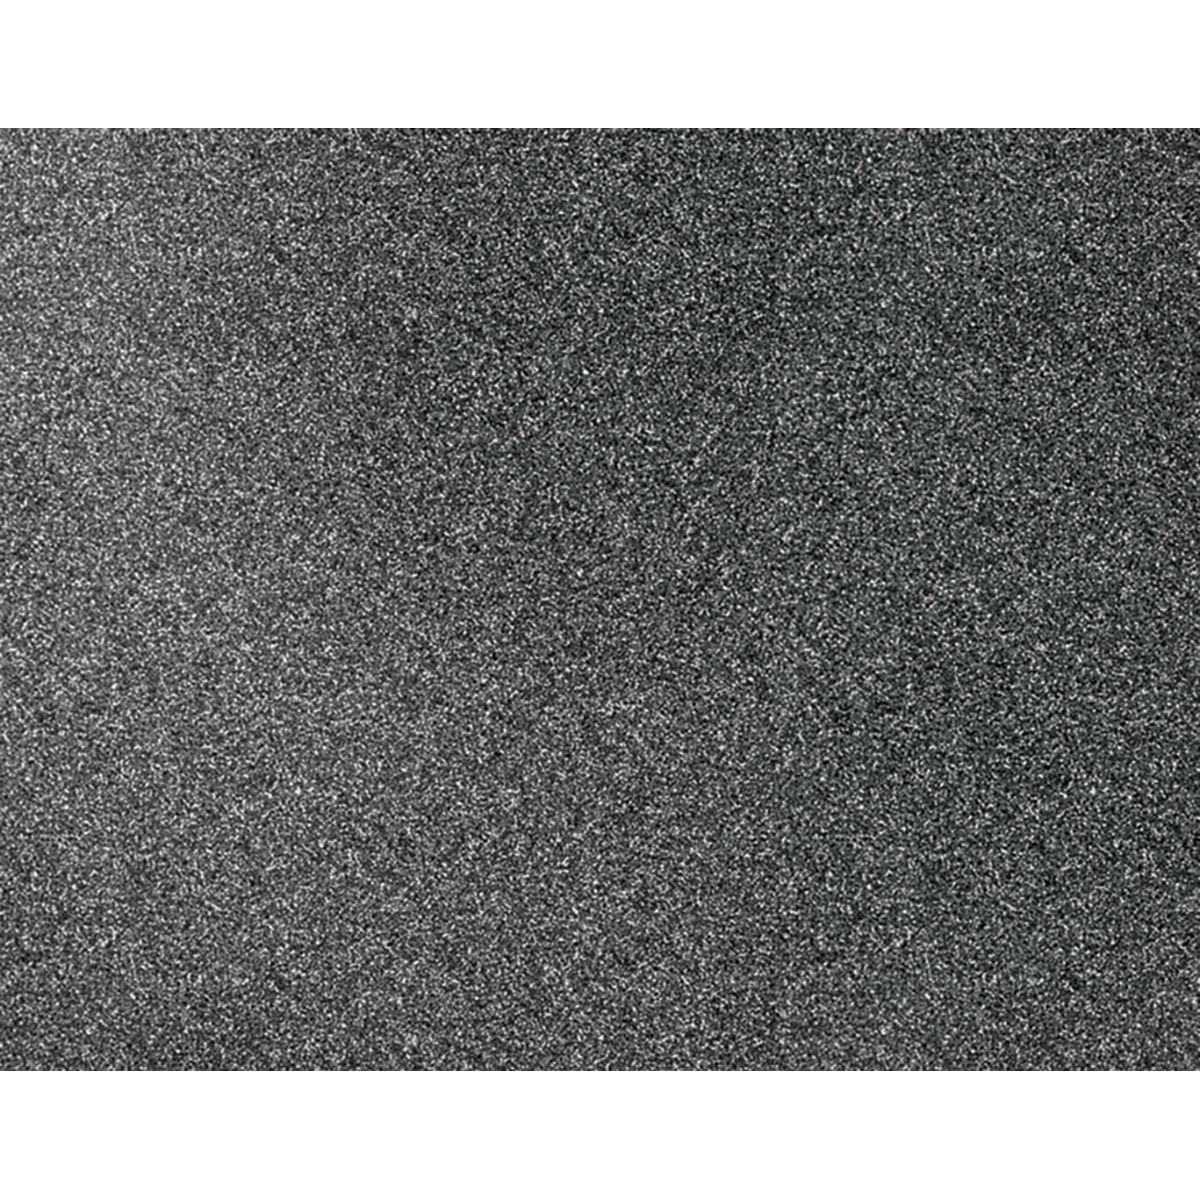 we r designer posterboard 22 x28 black glitter